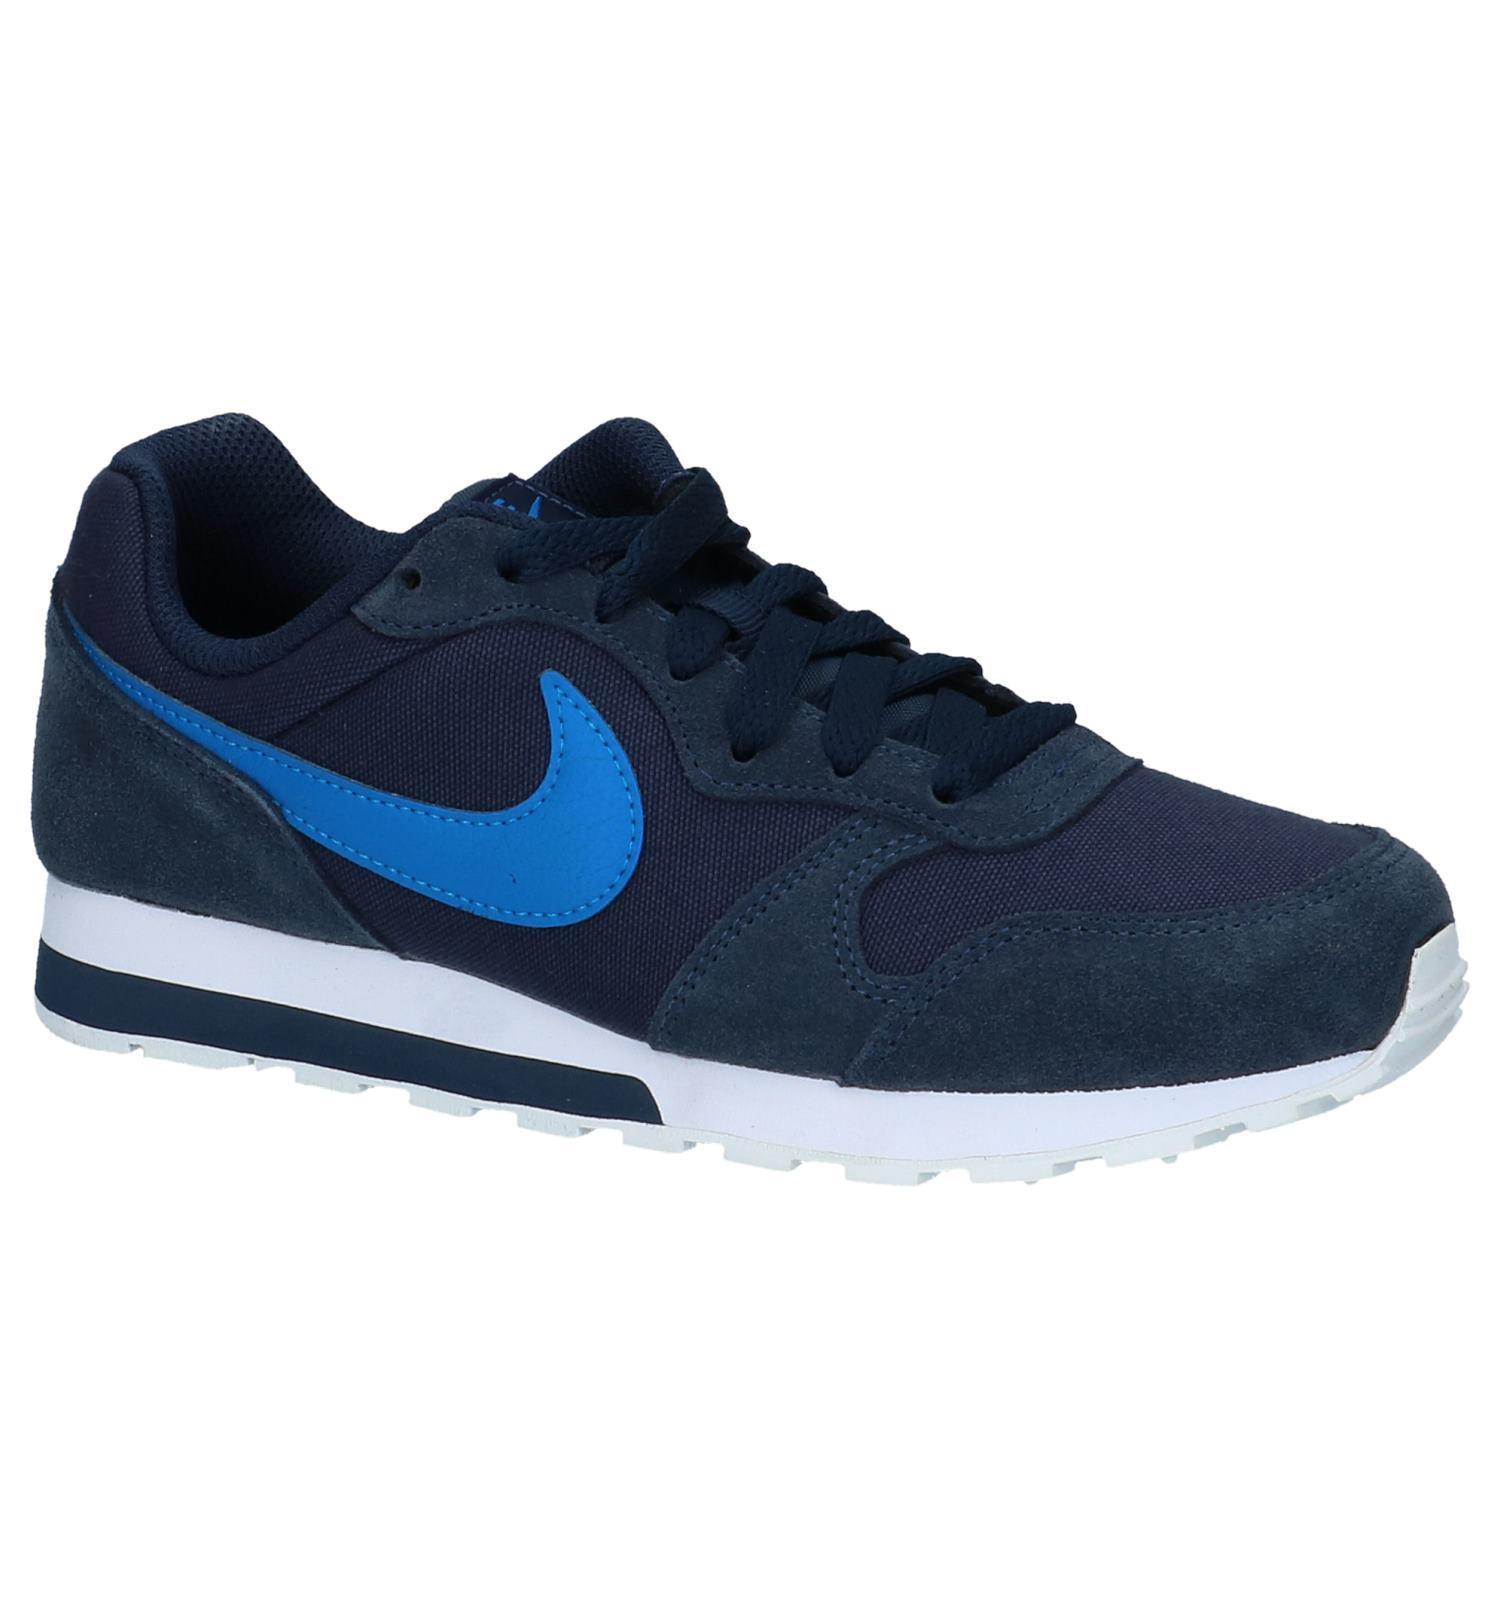 Gratis Sneakers be Verzend Gs En 2 Nike Blauwe Runner Torfs Md pxZXq80